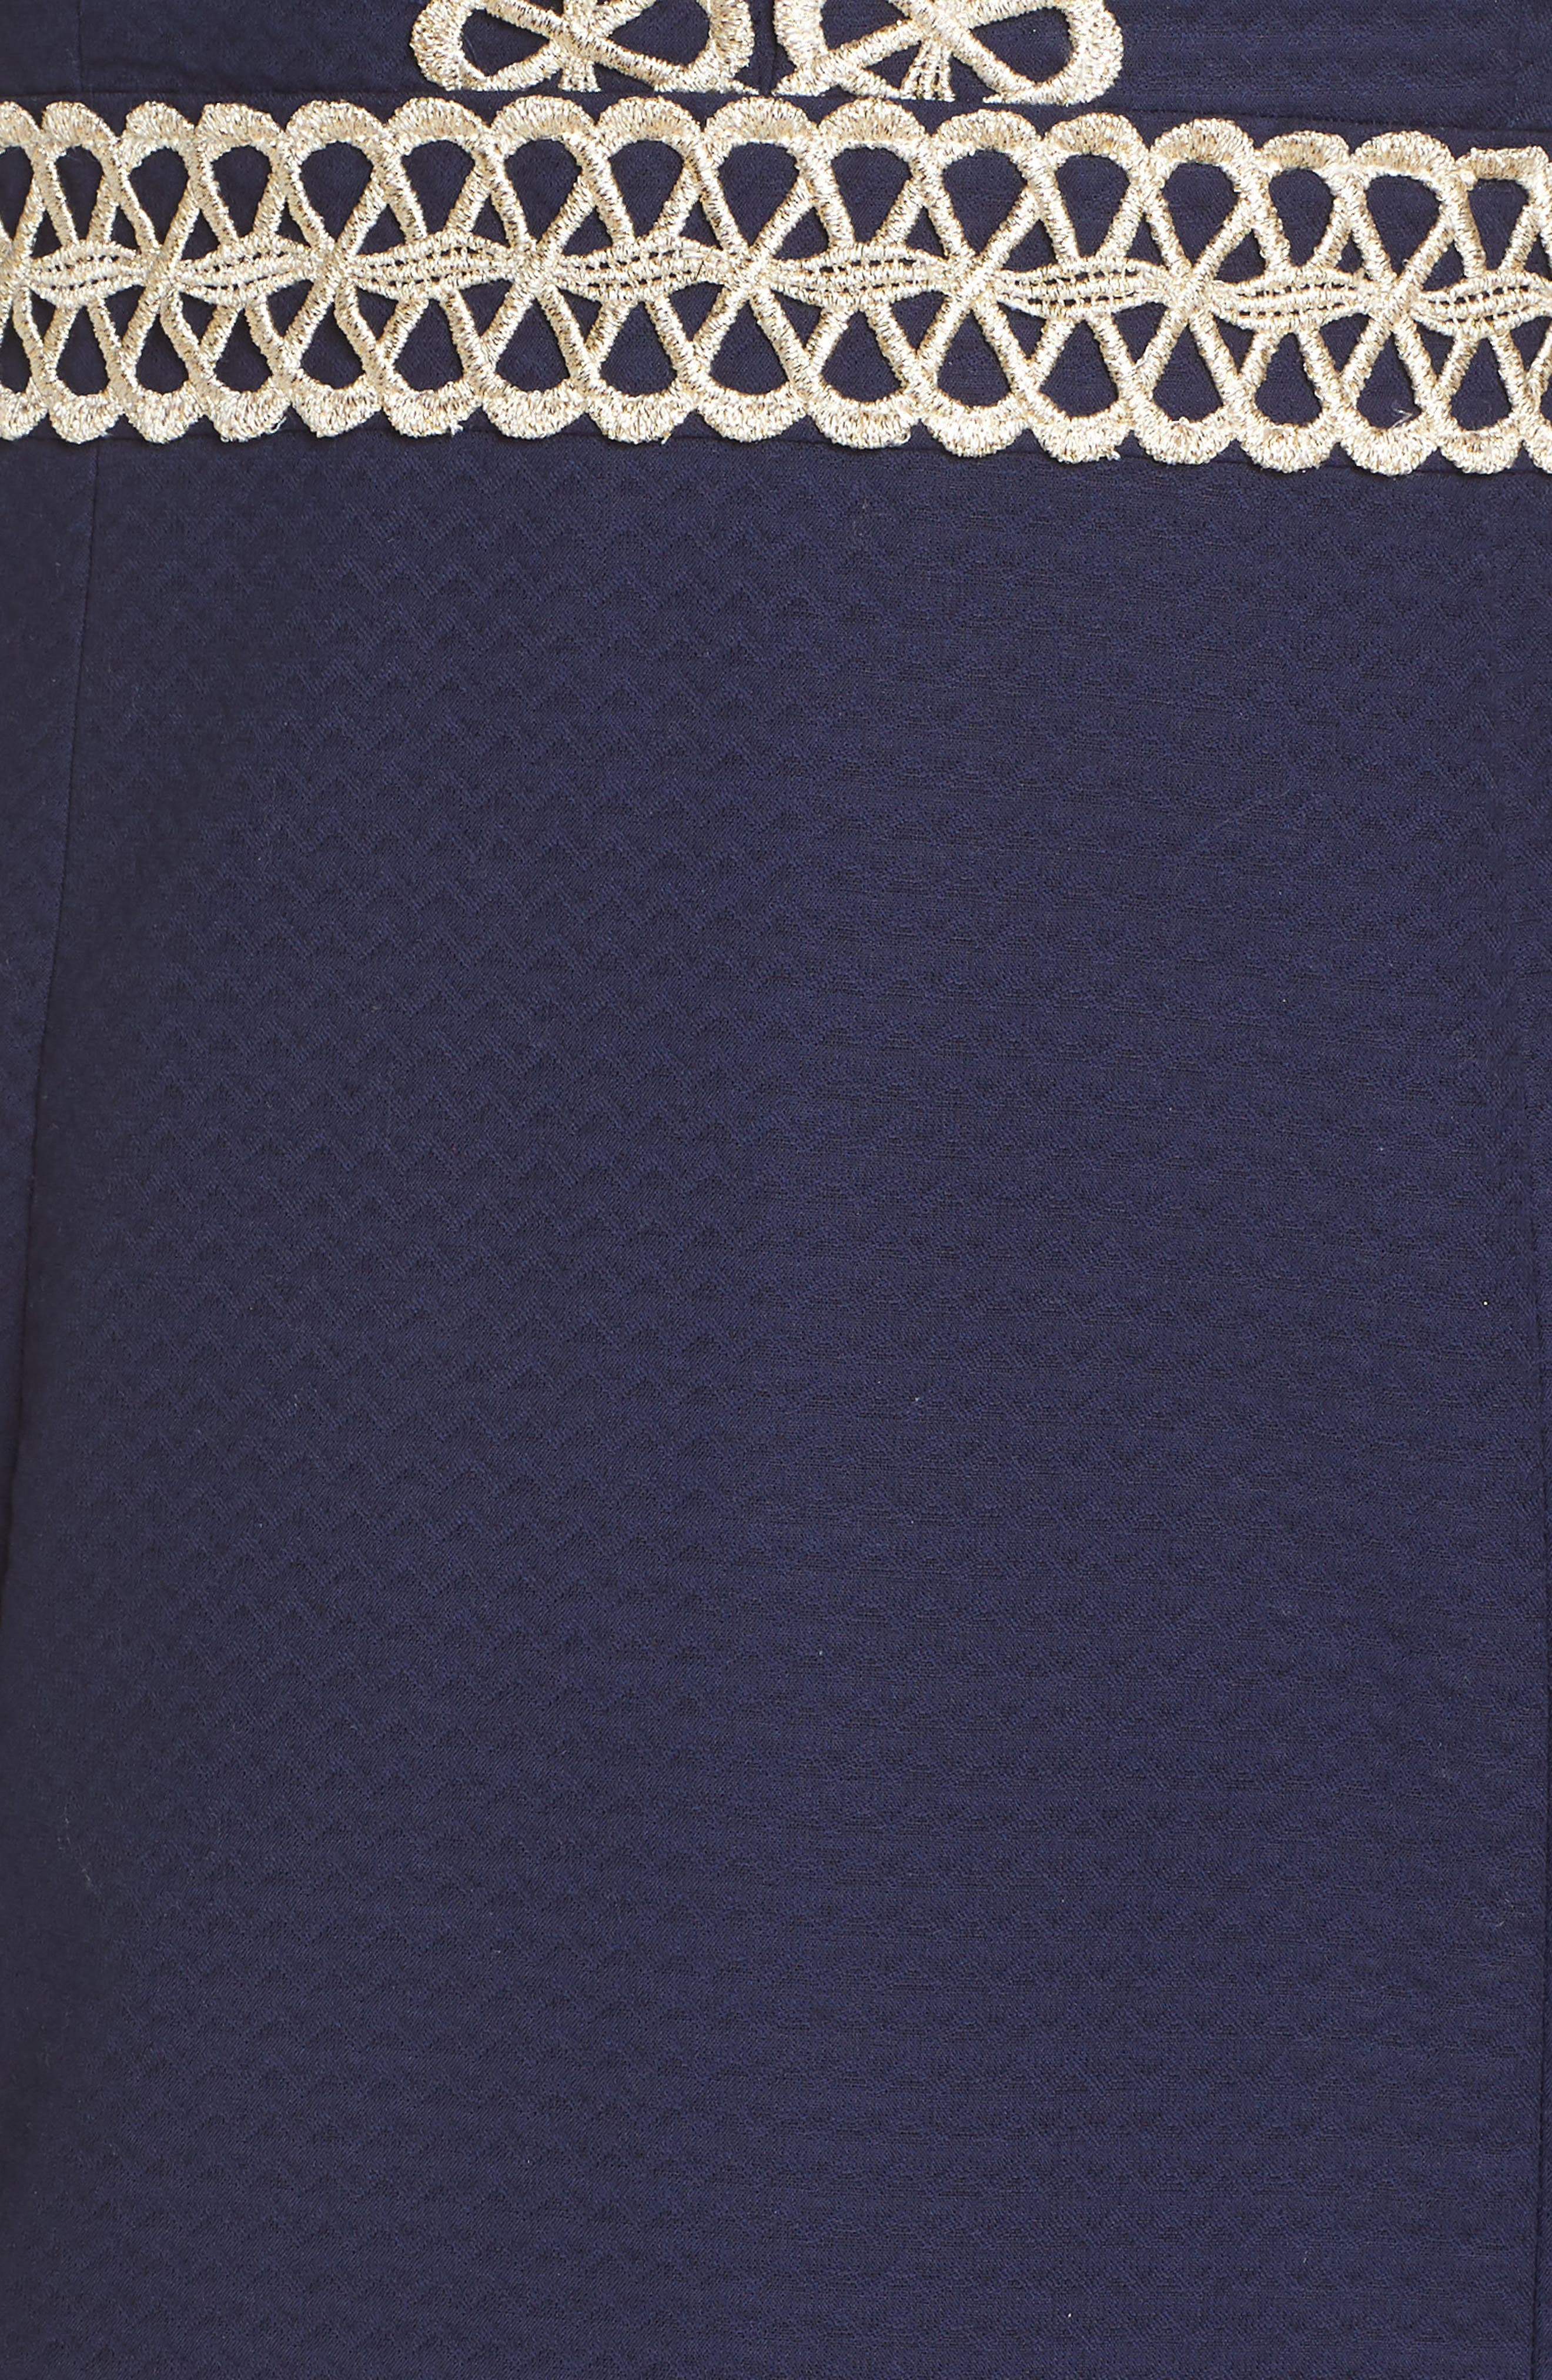 Trista Halter Sheath Dress,                             Alternate thumbnail 5, color,                             True Navy